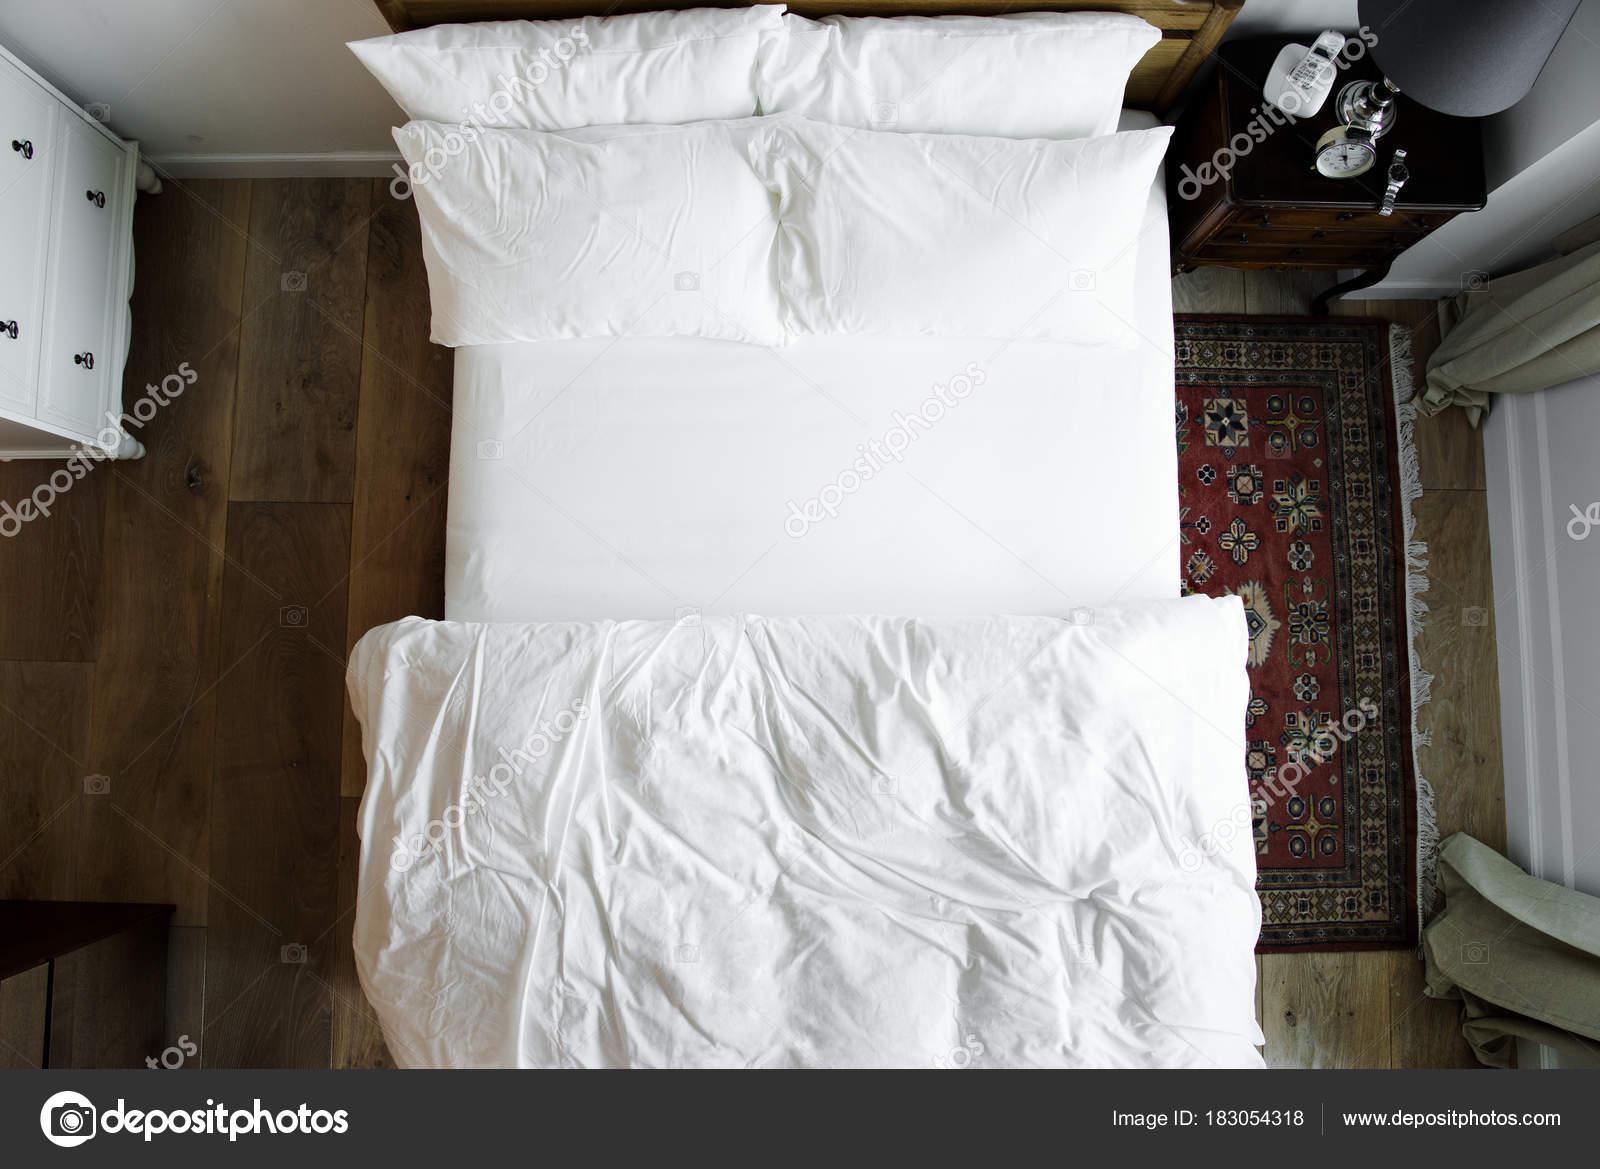 Bed top view Single Bed Top View Bed Bedroom Stock Photo Depositphotos Top View Bed Bedroom Stock Photo Rawpixel 183054318